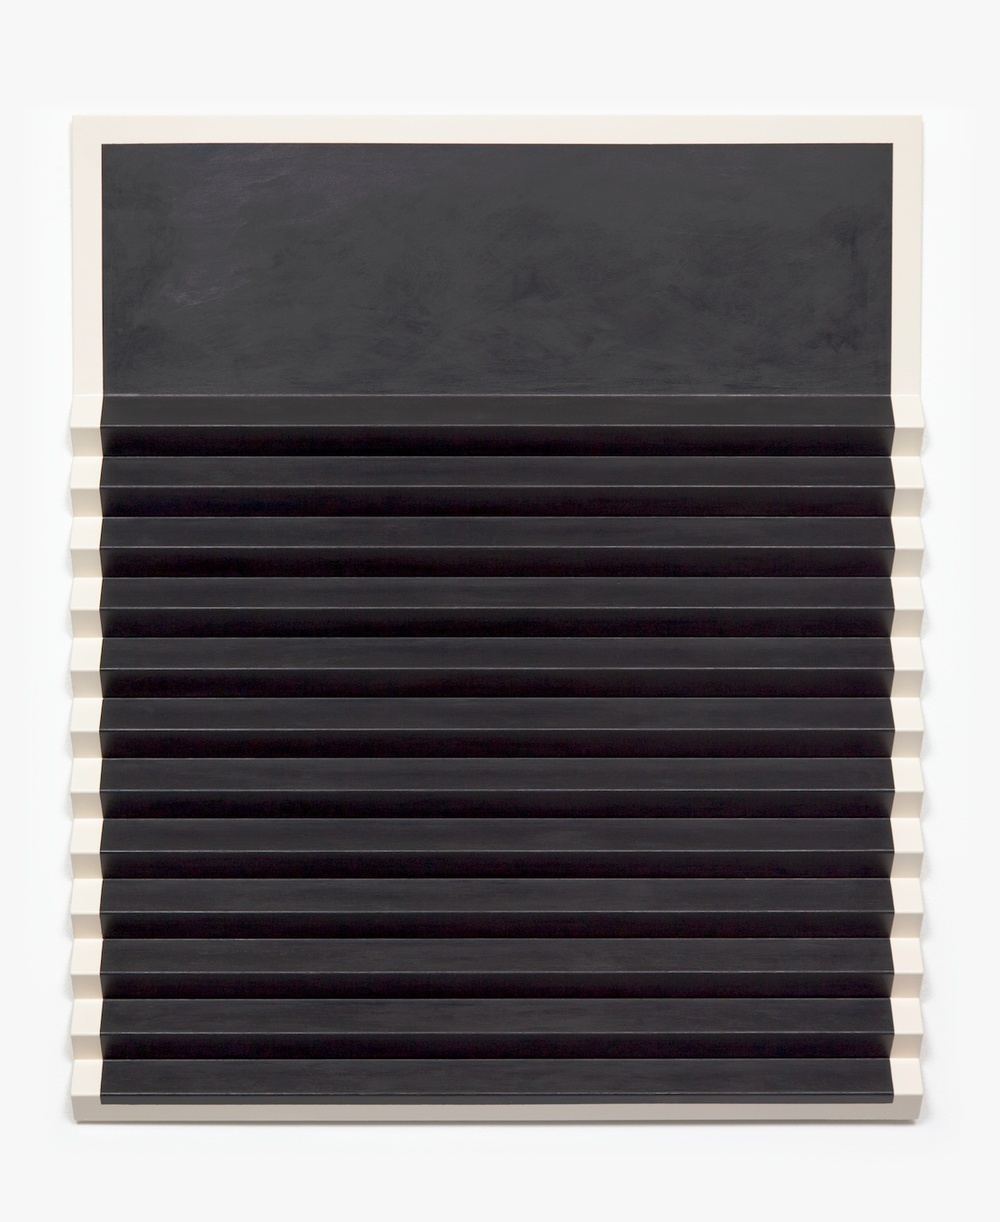 Lisa Williamson  Tuxedo  2011 Acrylic and enamel on steel 33 ¼h x 27 ¾w x 1 ¼d in LW086